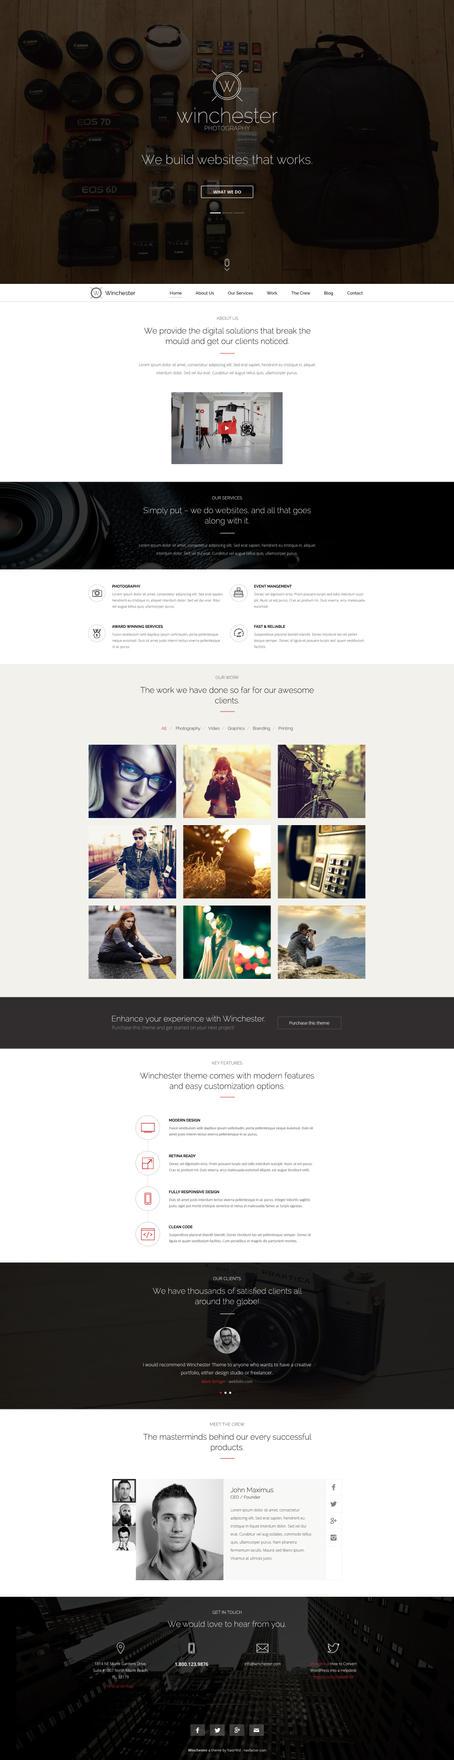 Winchester - Portfolio Theme by Nas-wd